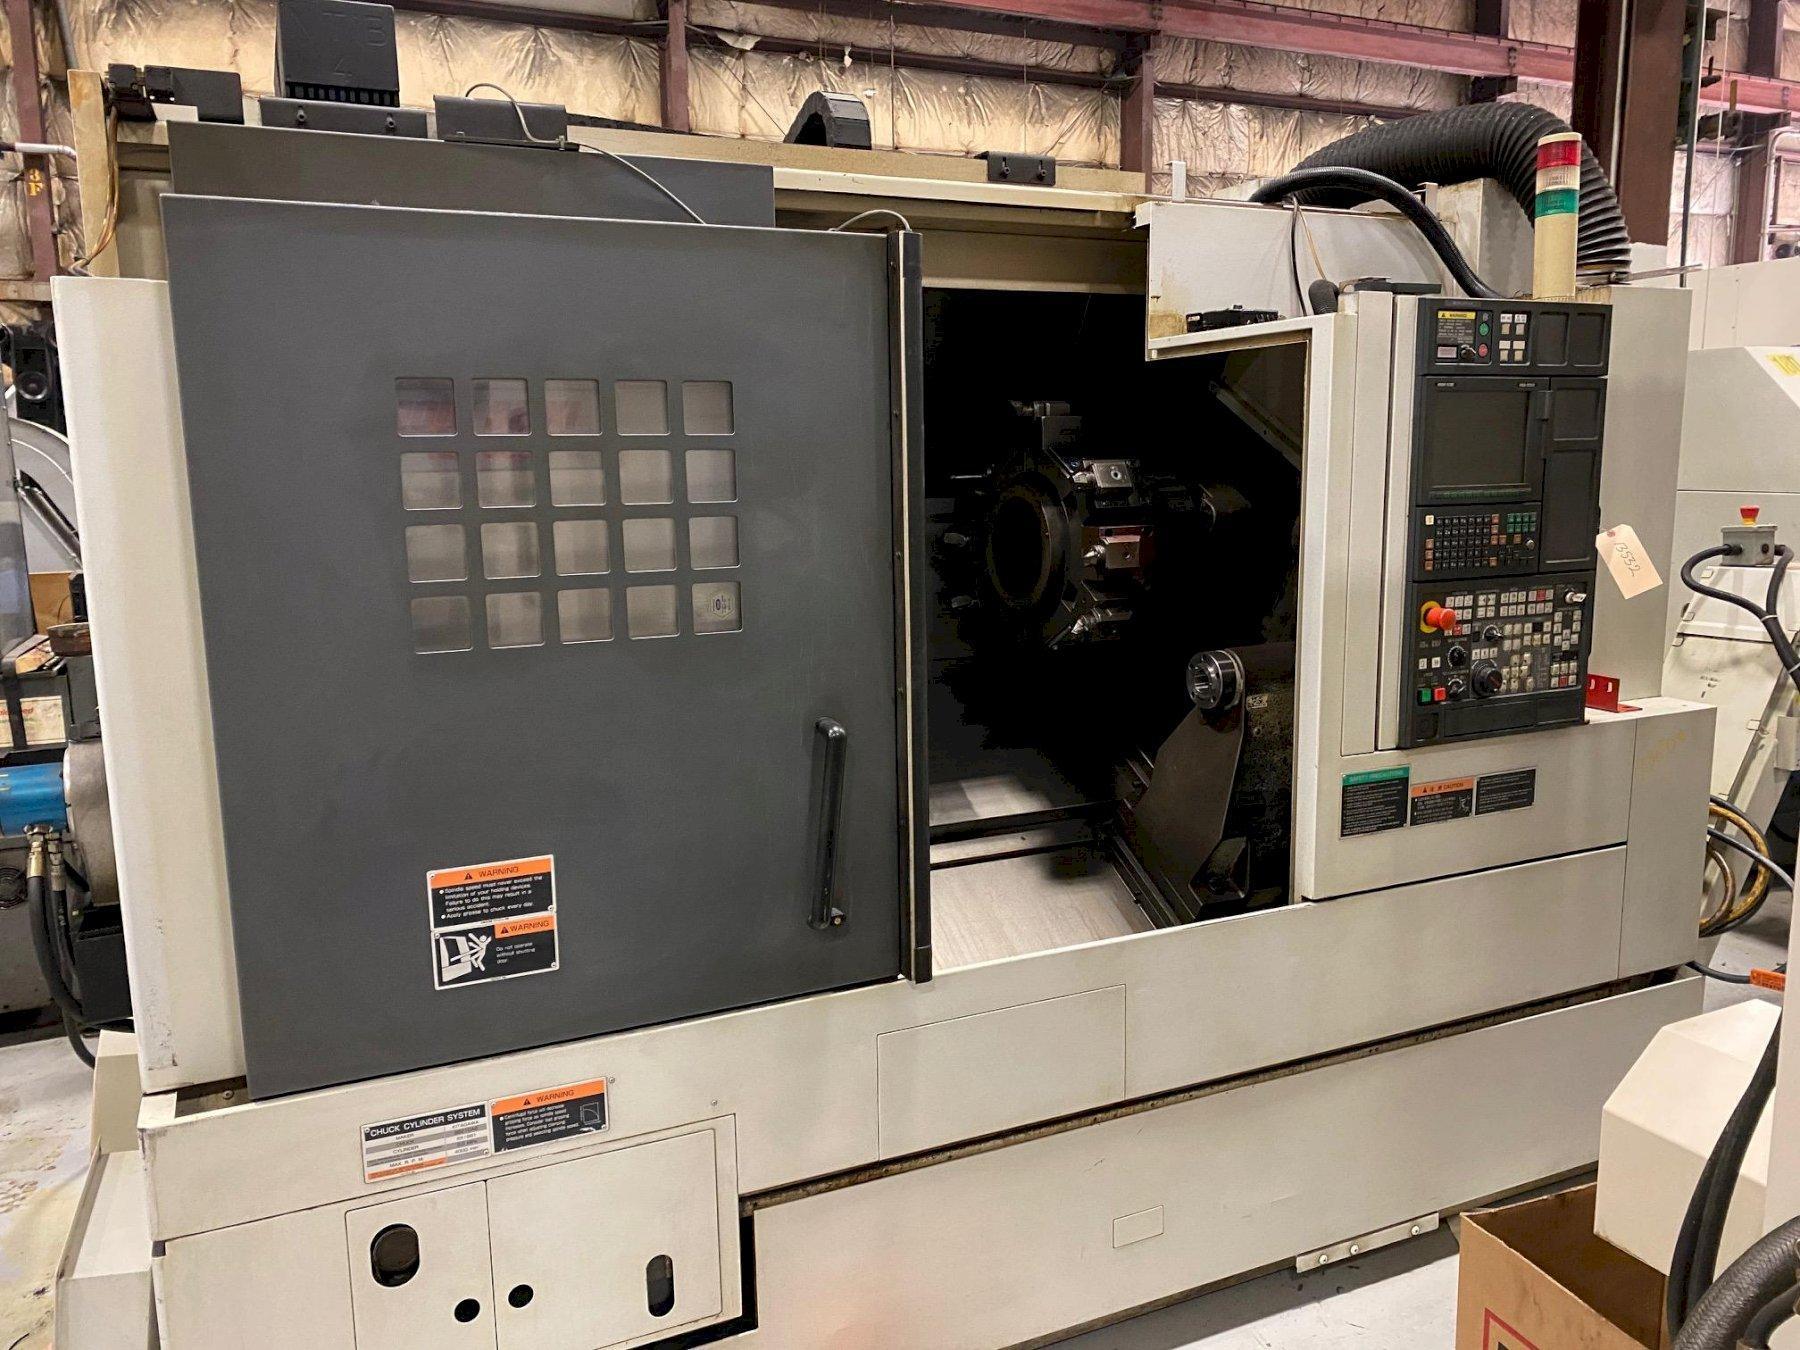 2009 Mori Seiki NL2500MC/700 CNC Horizontal Lathe